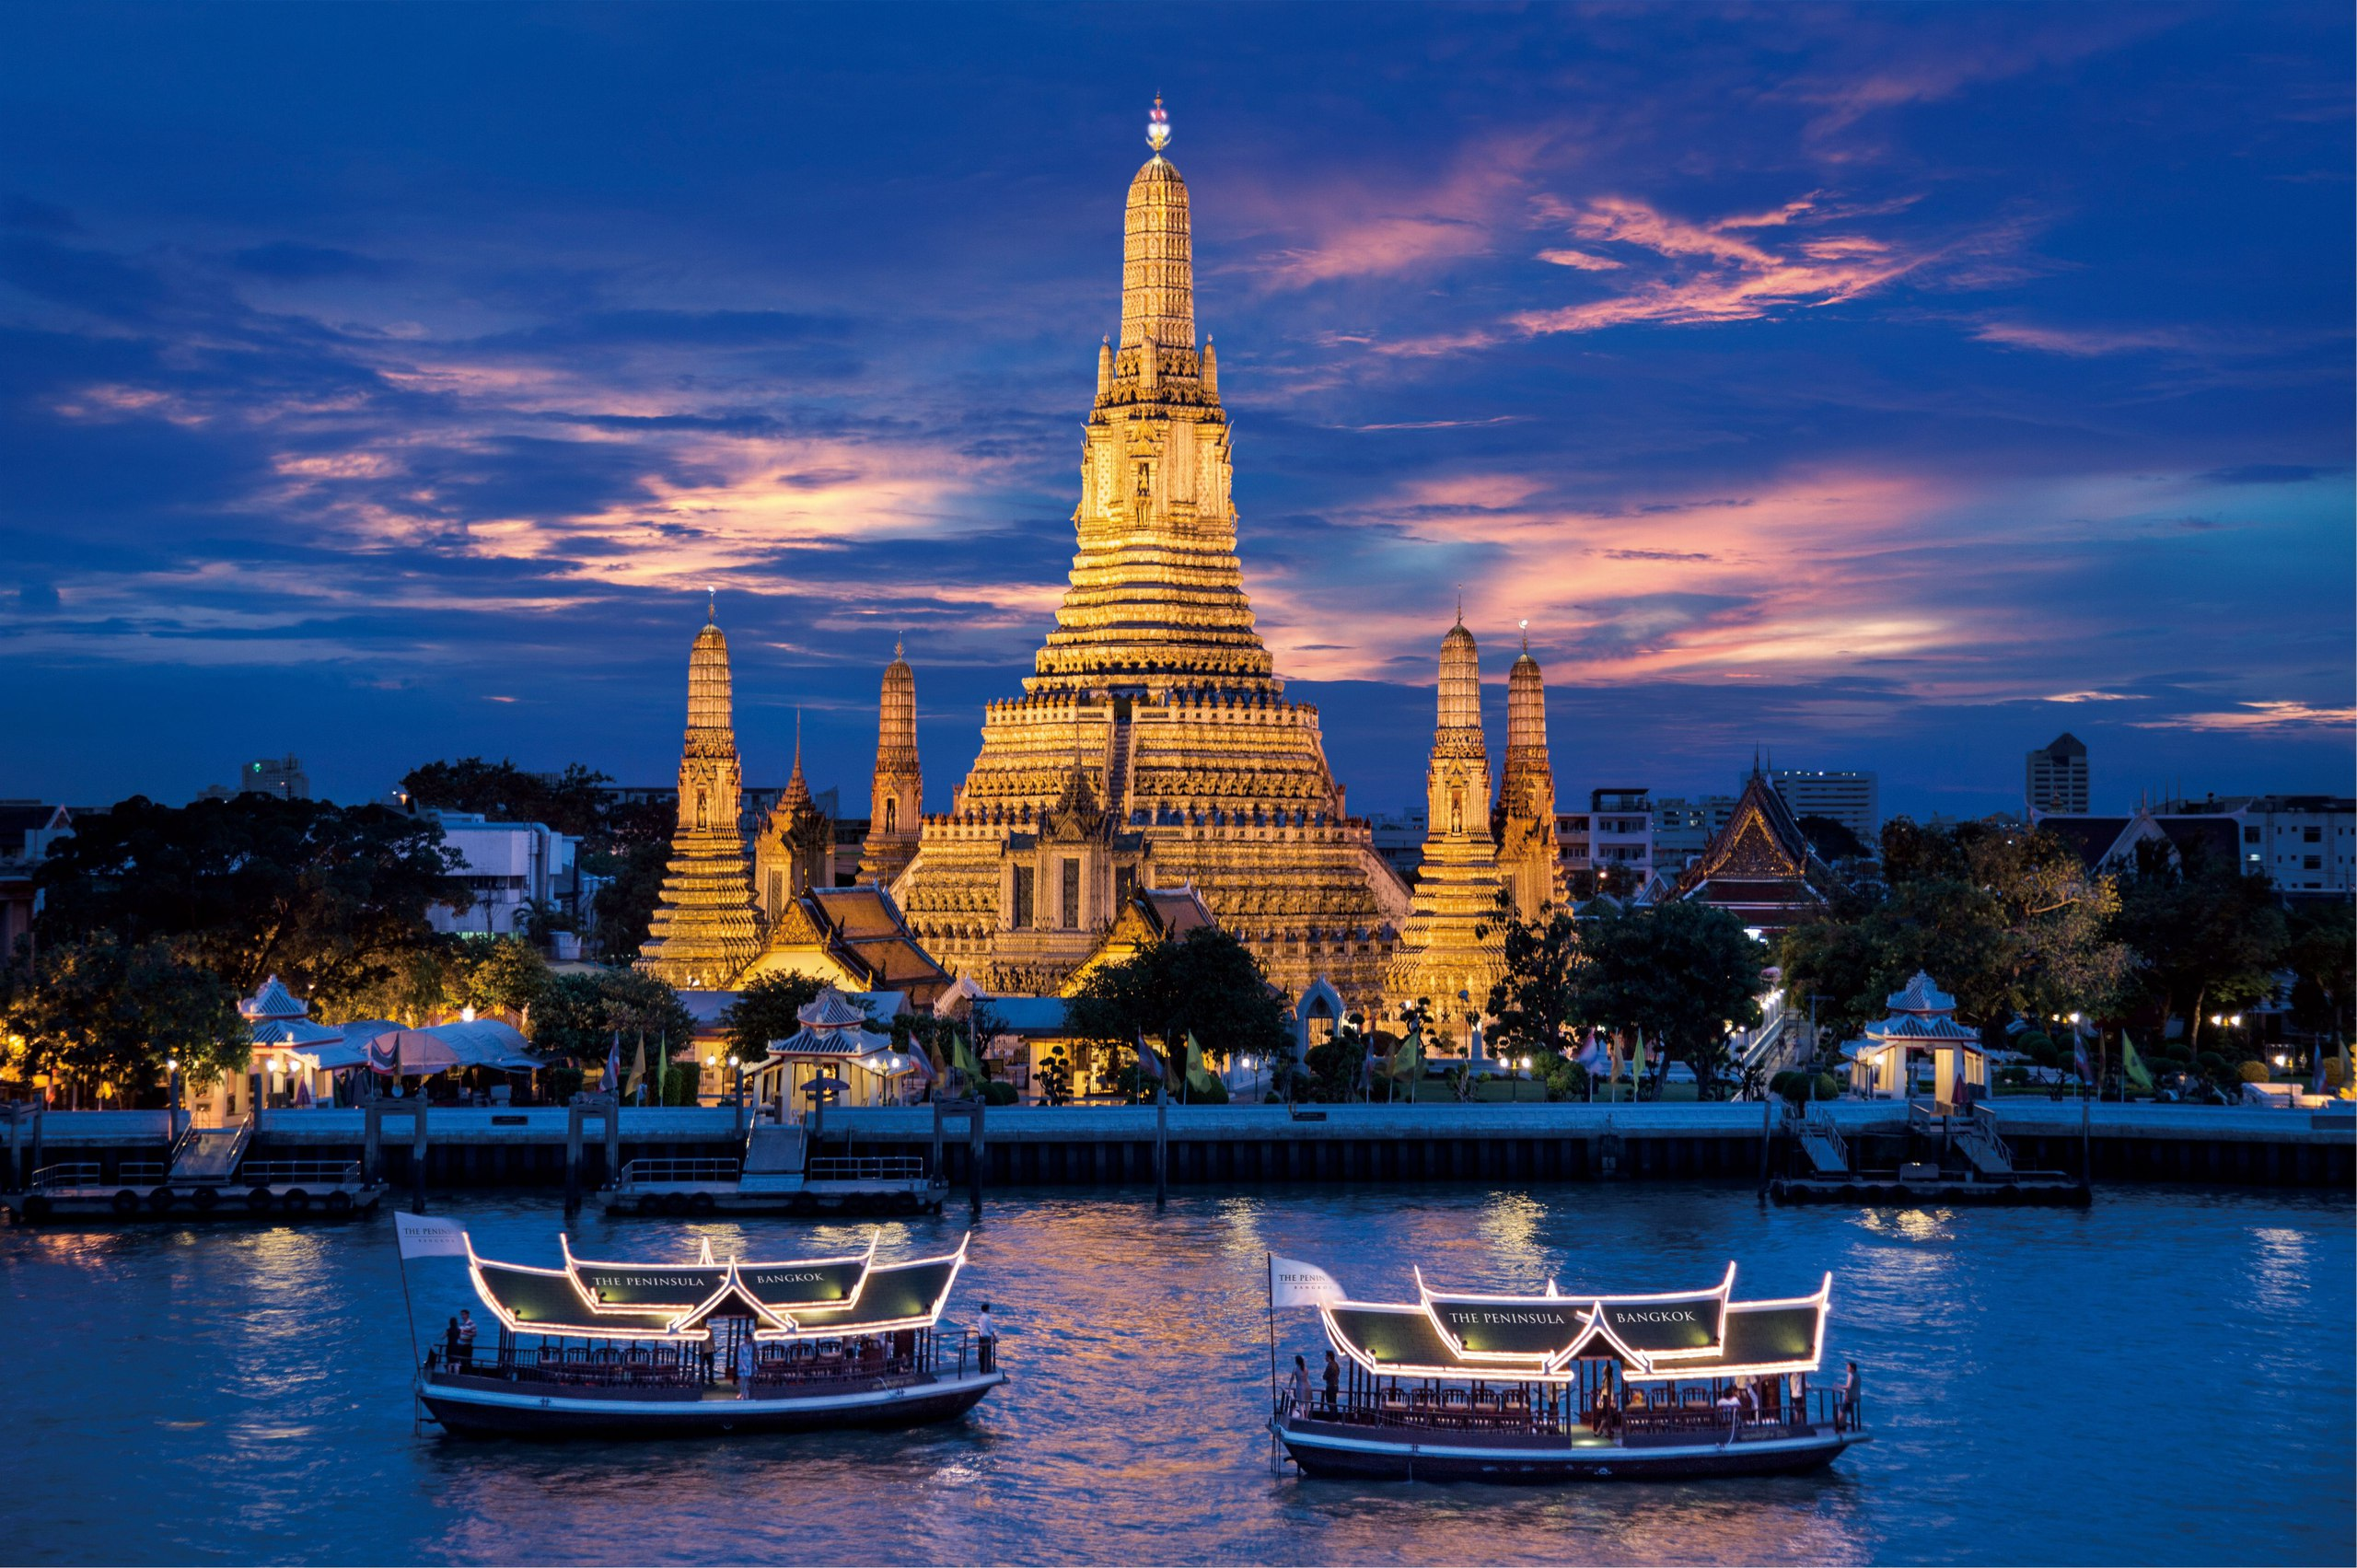 Елена Руденко (Валтея). Таиланд.  Фото и видео, а также мои впечатления, отзывы, советы и т.д. G-vC7JMgv3Q